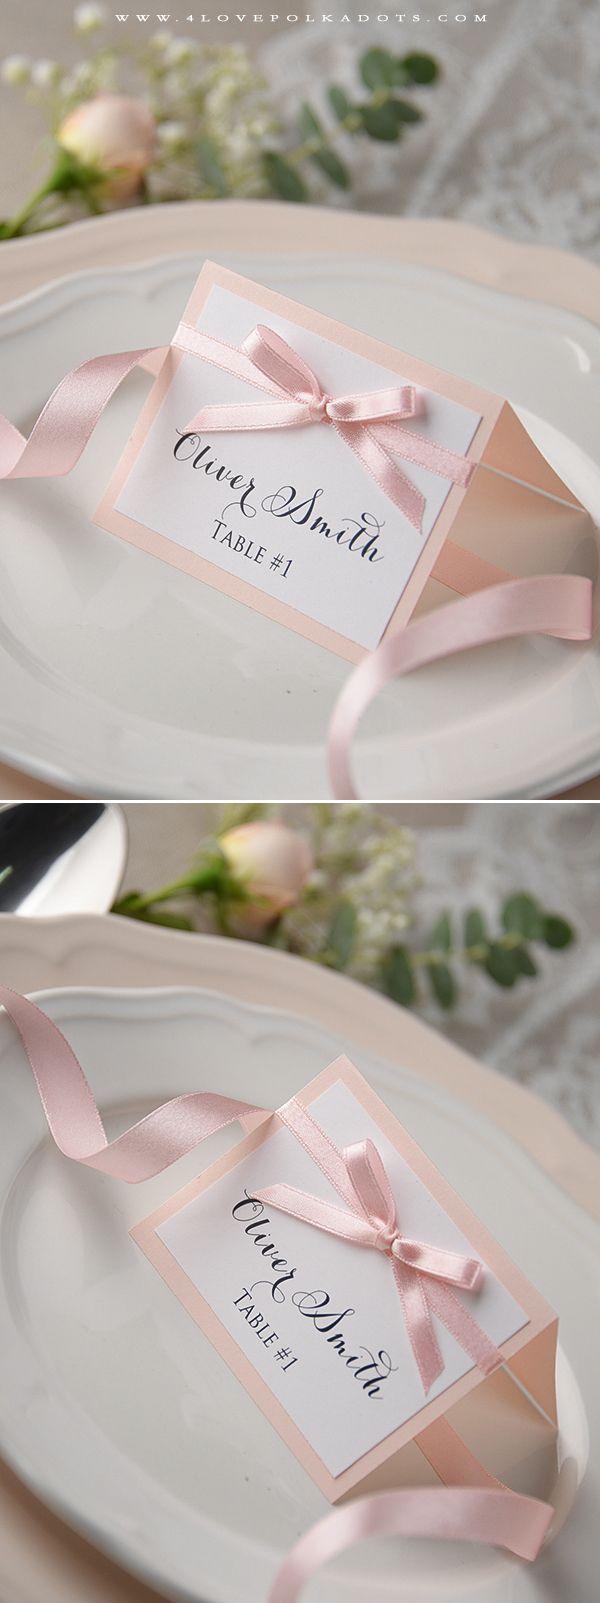 Best 25+ Wedding place cards ideas on Pinterest